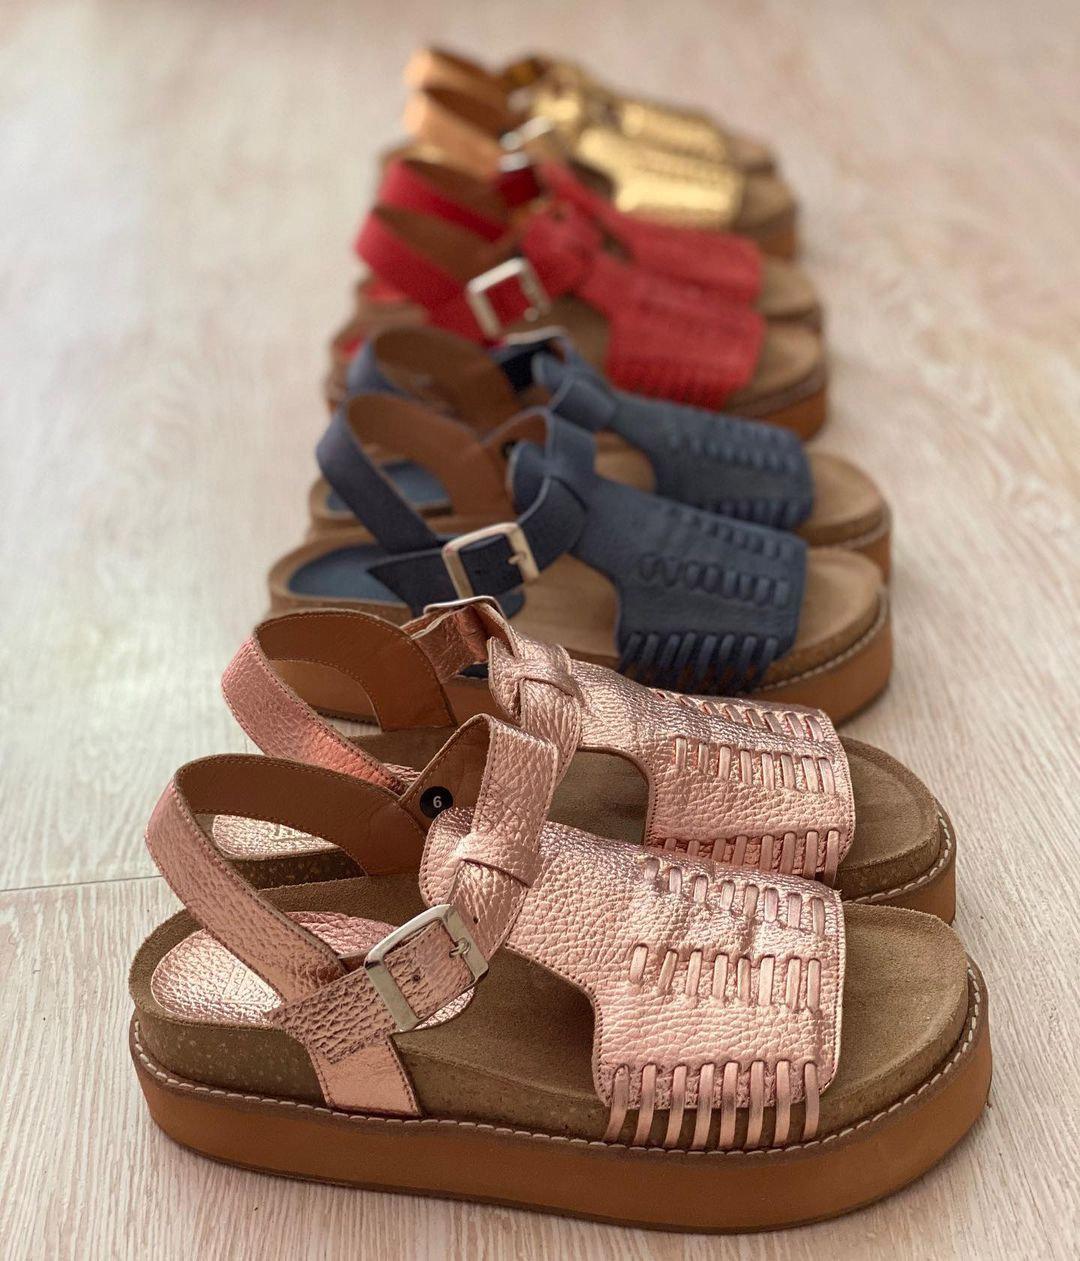 sandalias de moda 2021 moda mujer